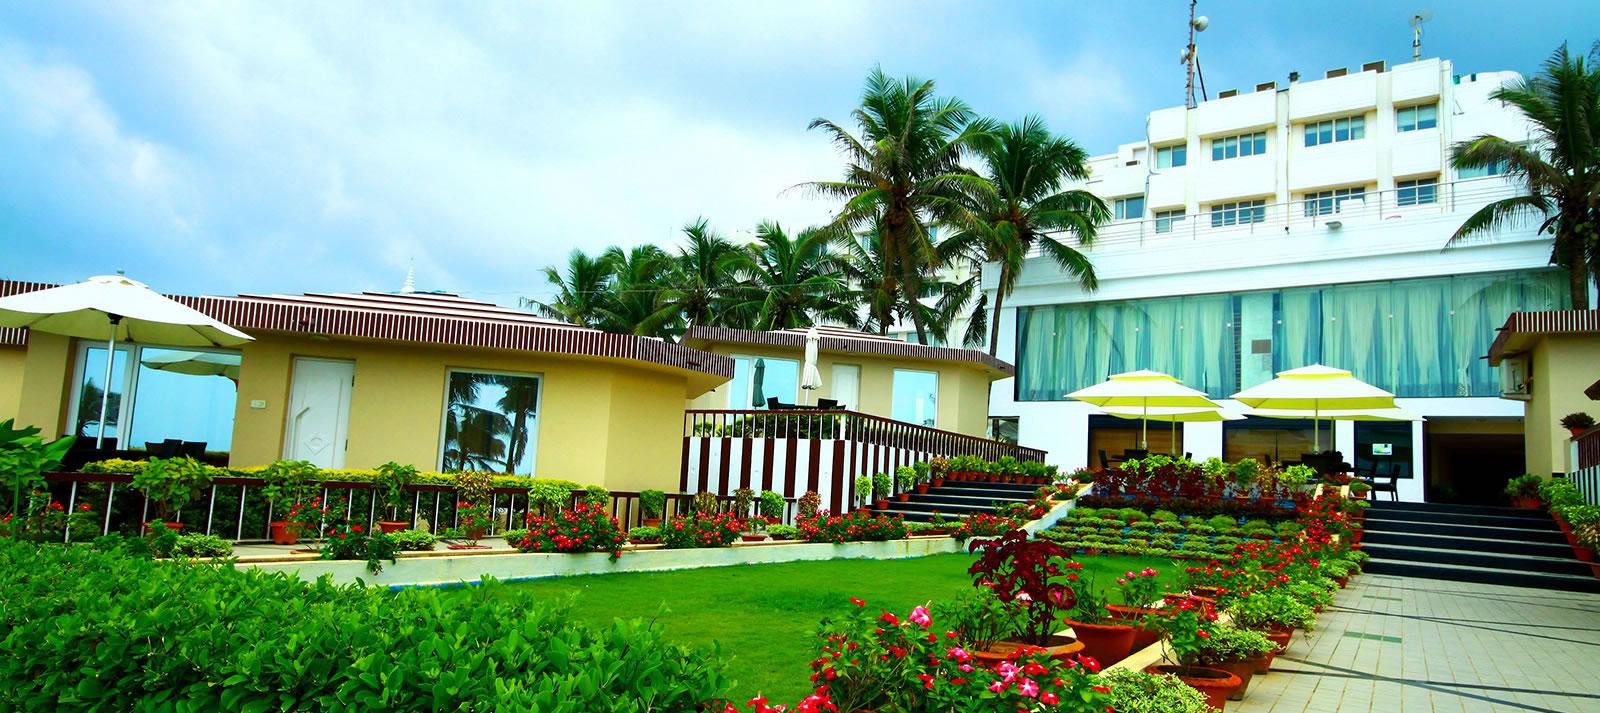 1487079427-Hotel_Holiday_Resort_2.jpg